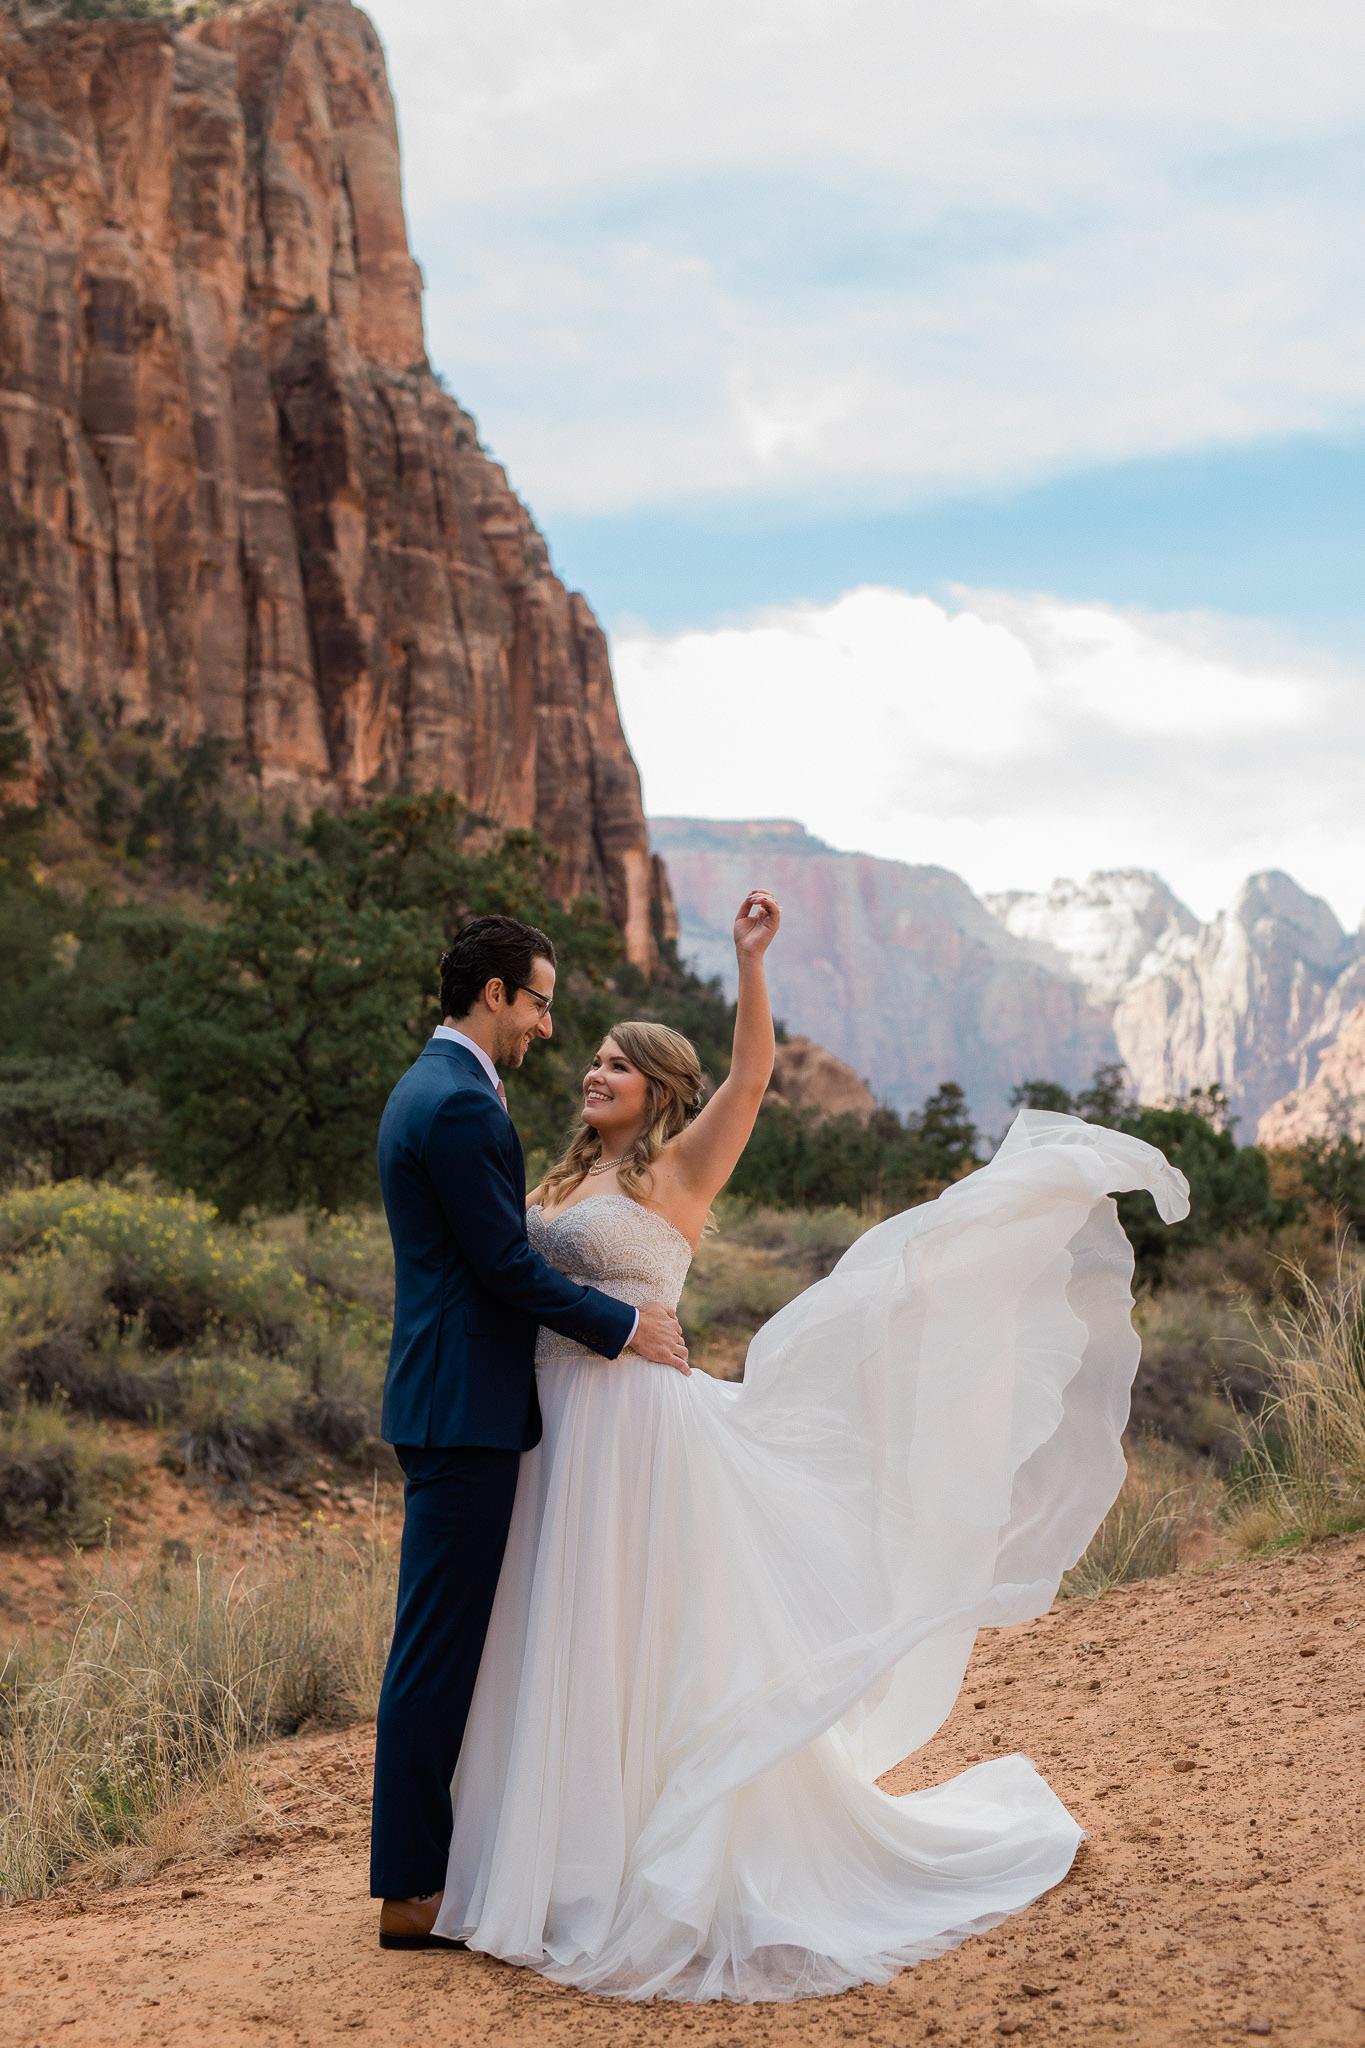 Zion National Park Wedding Photographer Kyle Loves Tori Photography